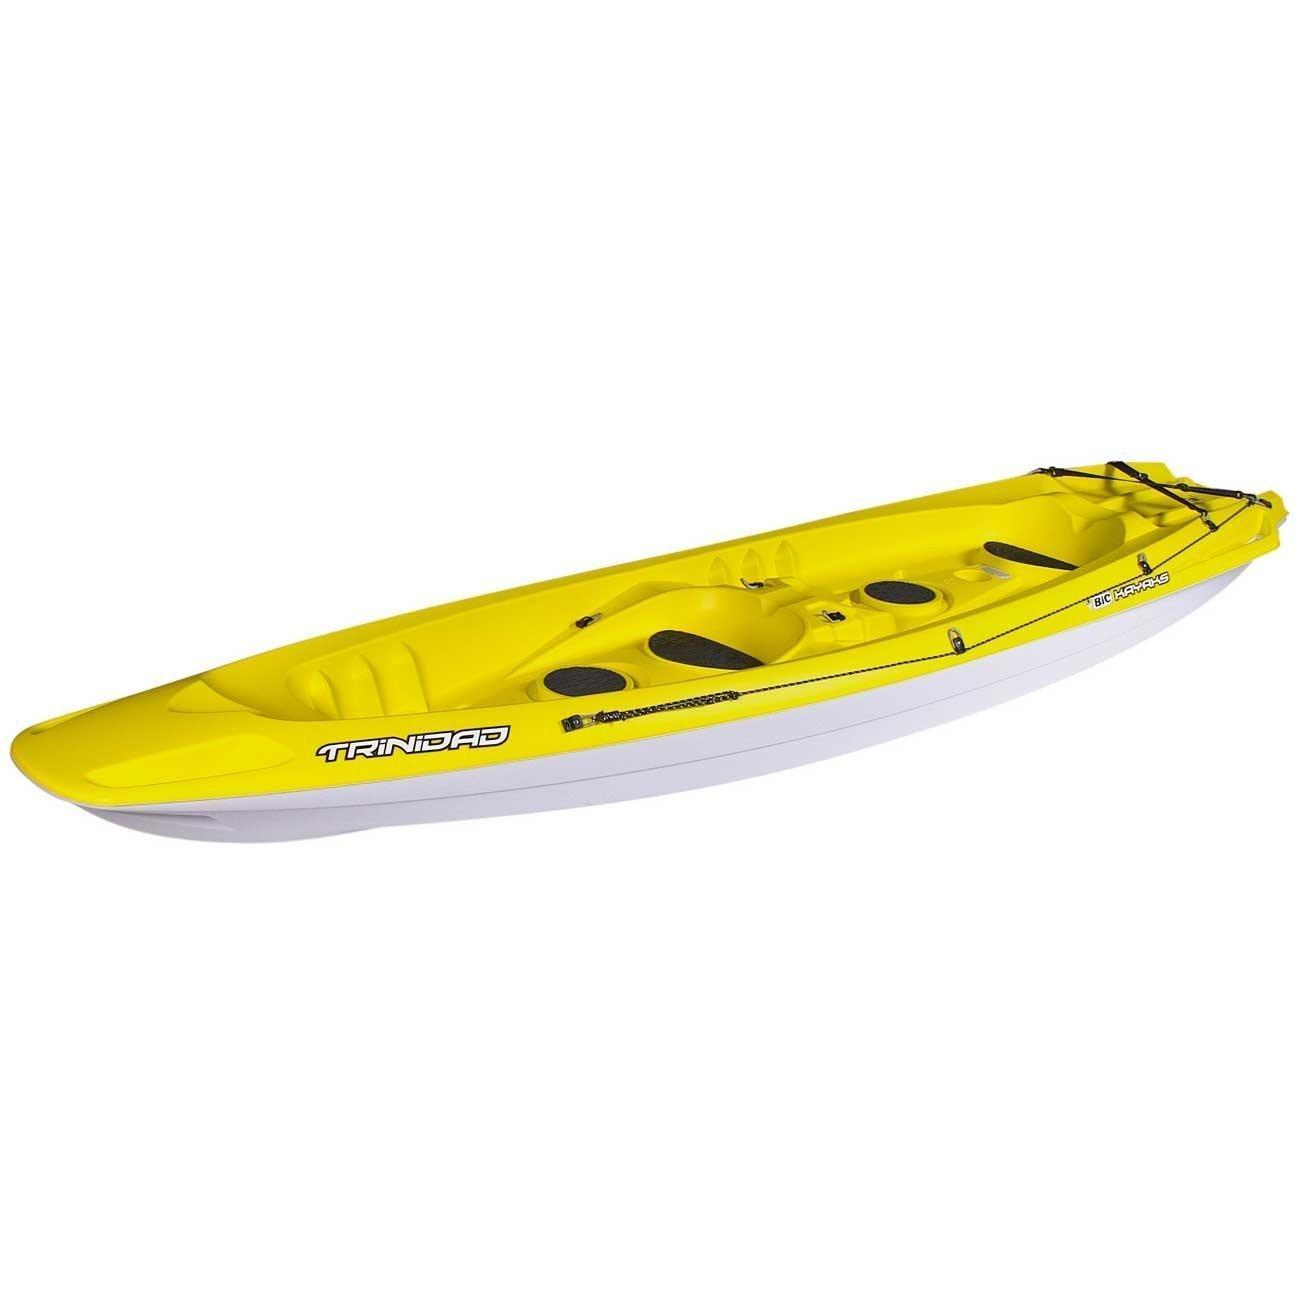 Kalao Yellow 2人乗りシーカヤック